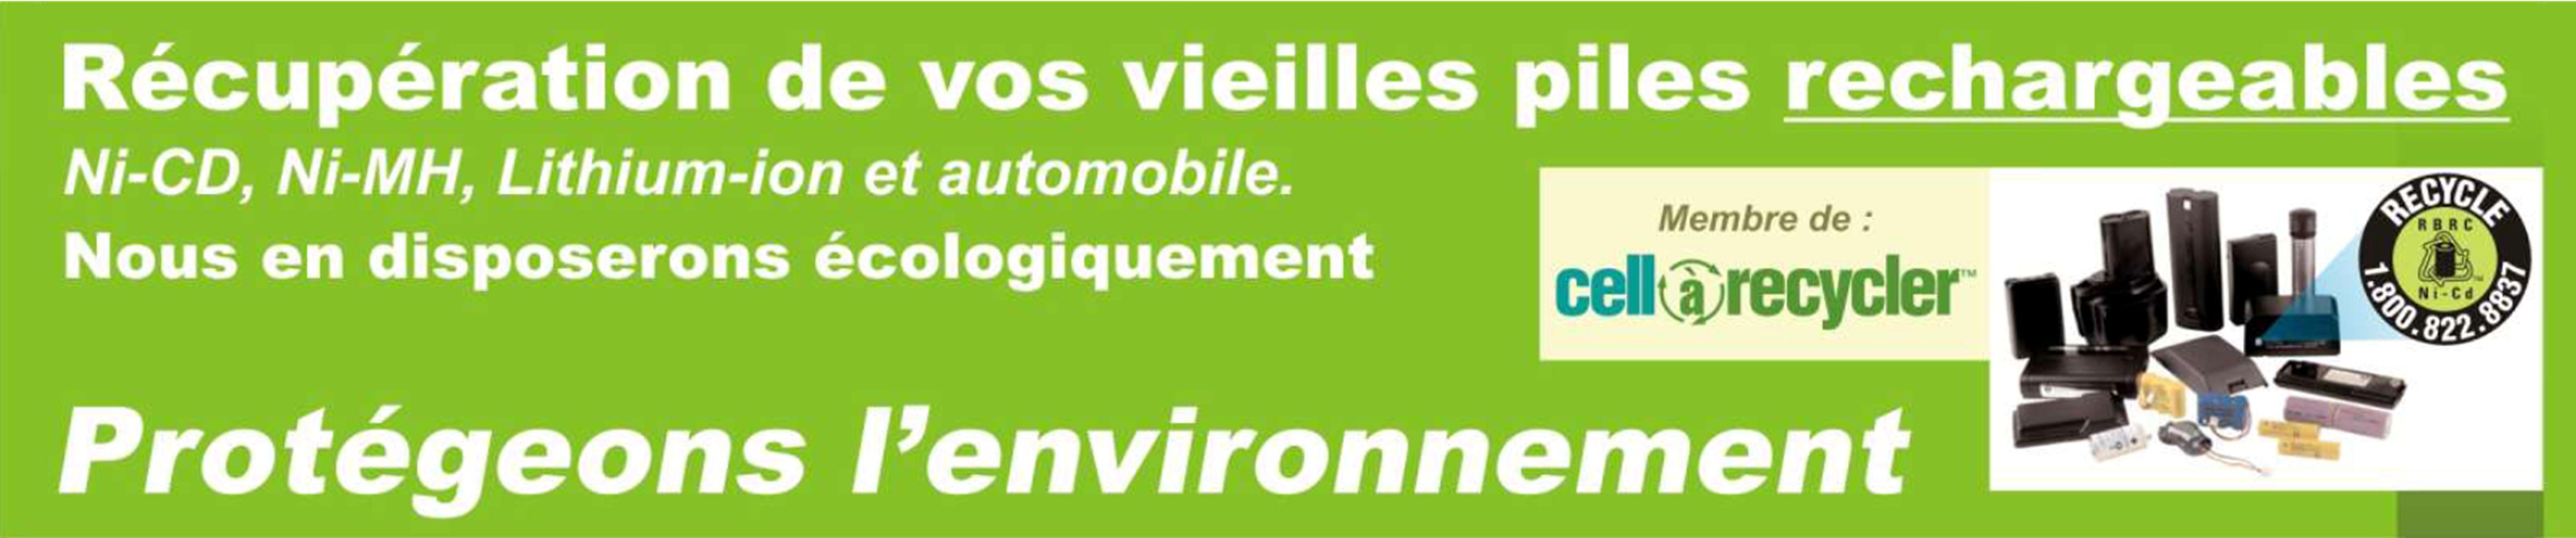 Environnement2